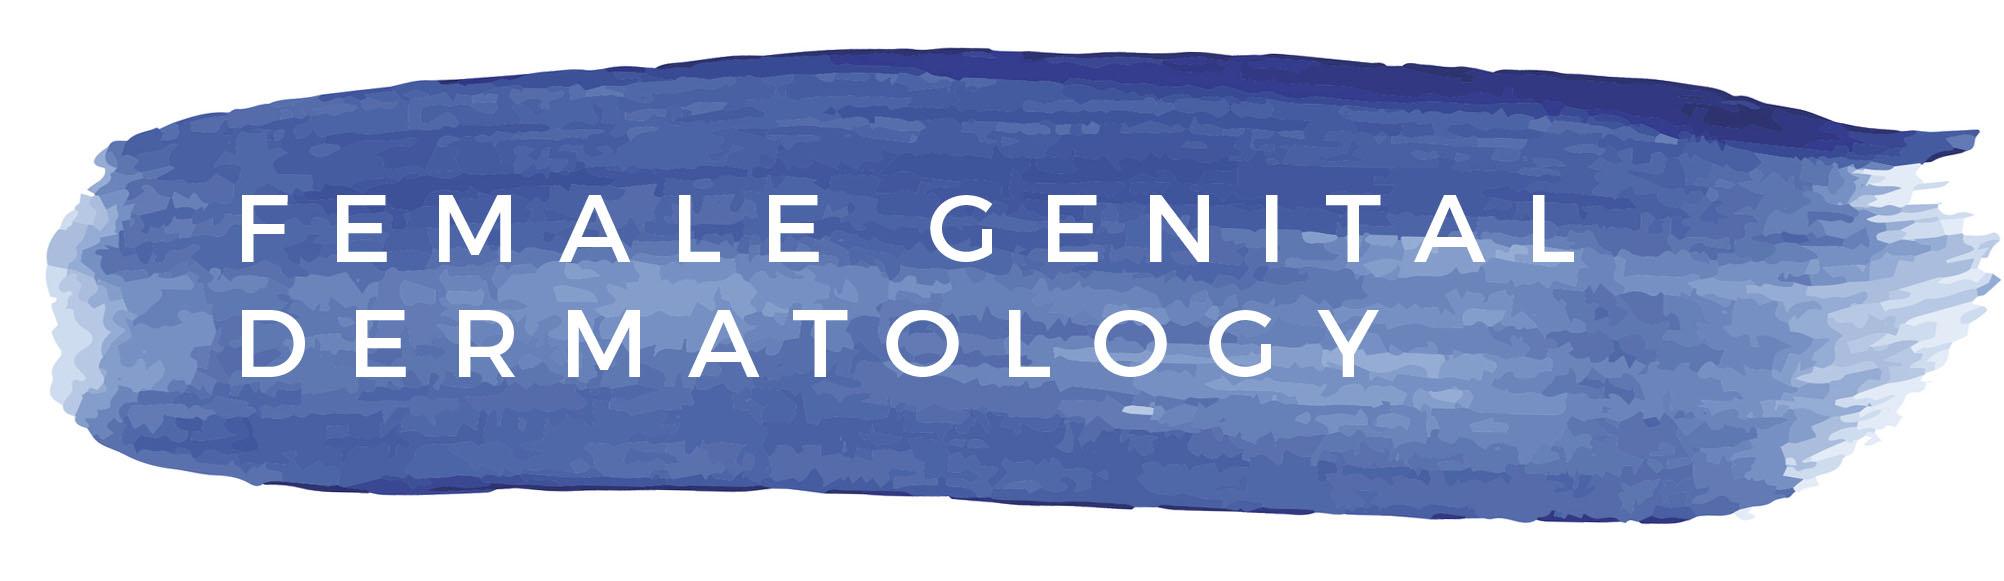 Female Genital Dermatology.jpg